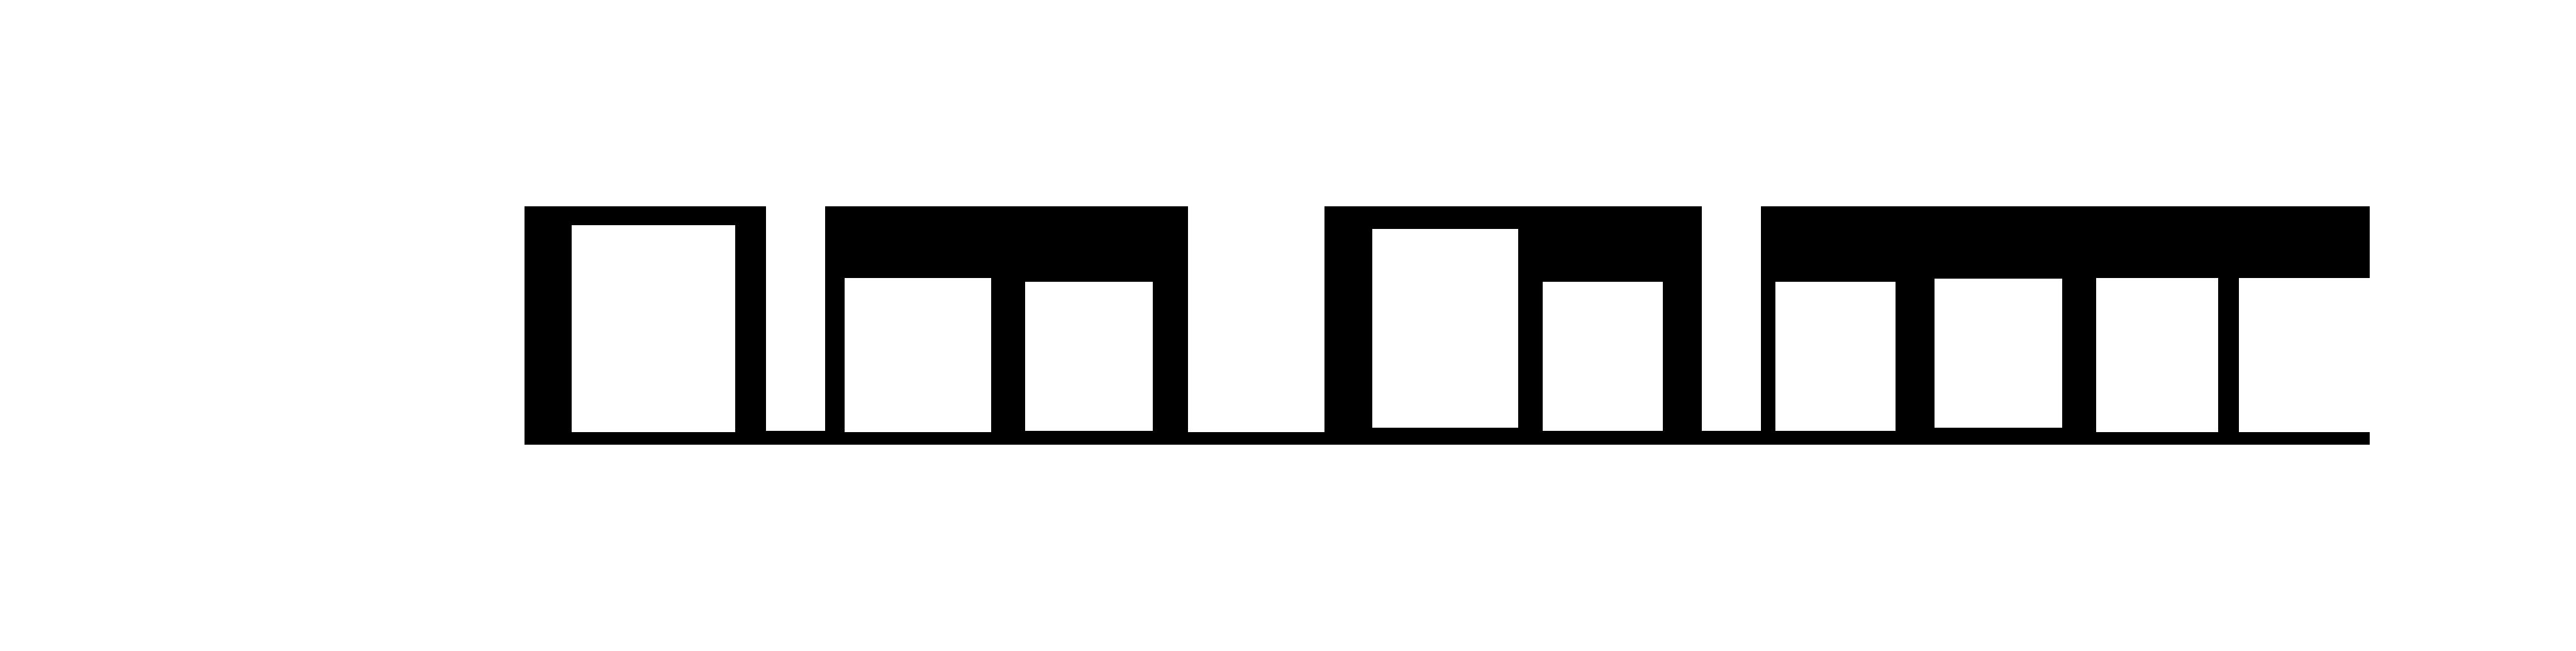 Cloud Balance